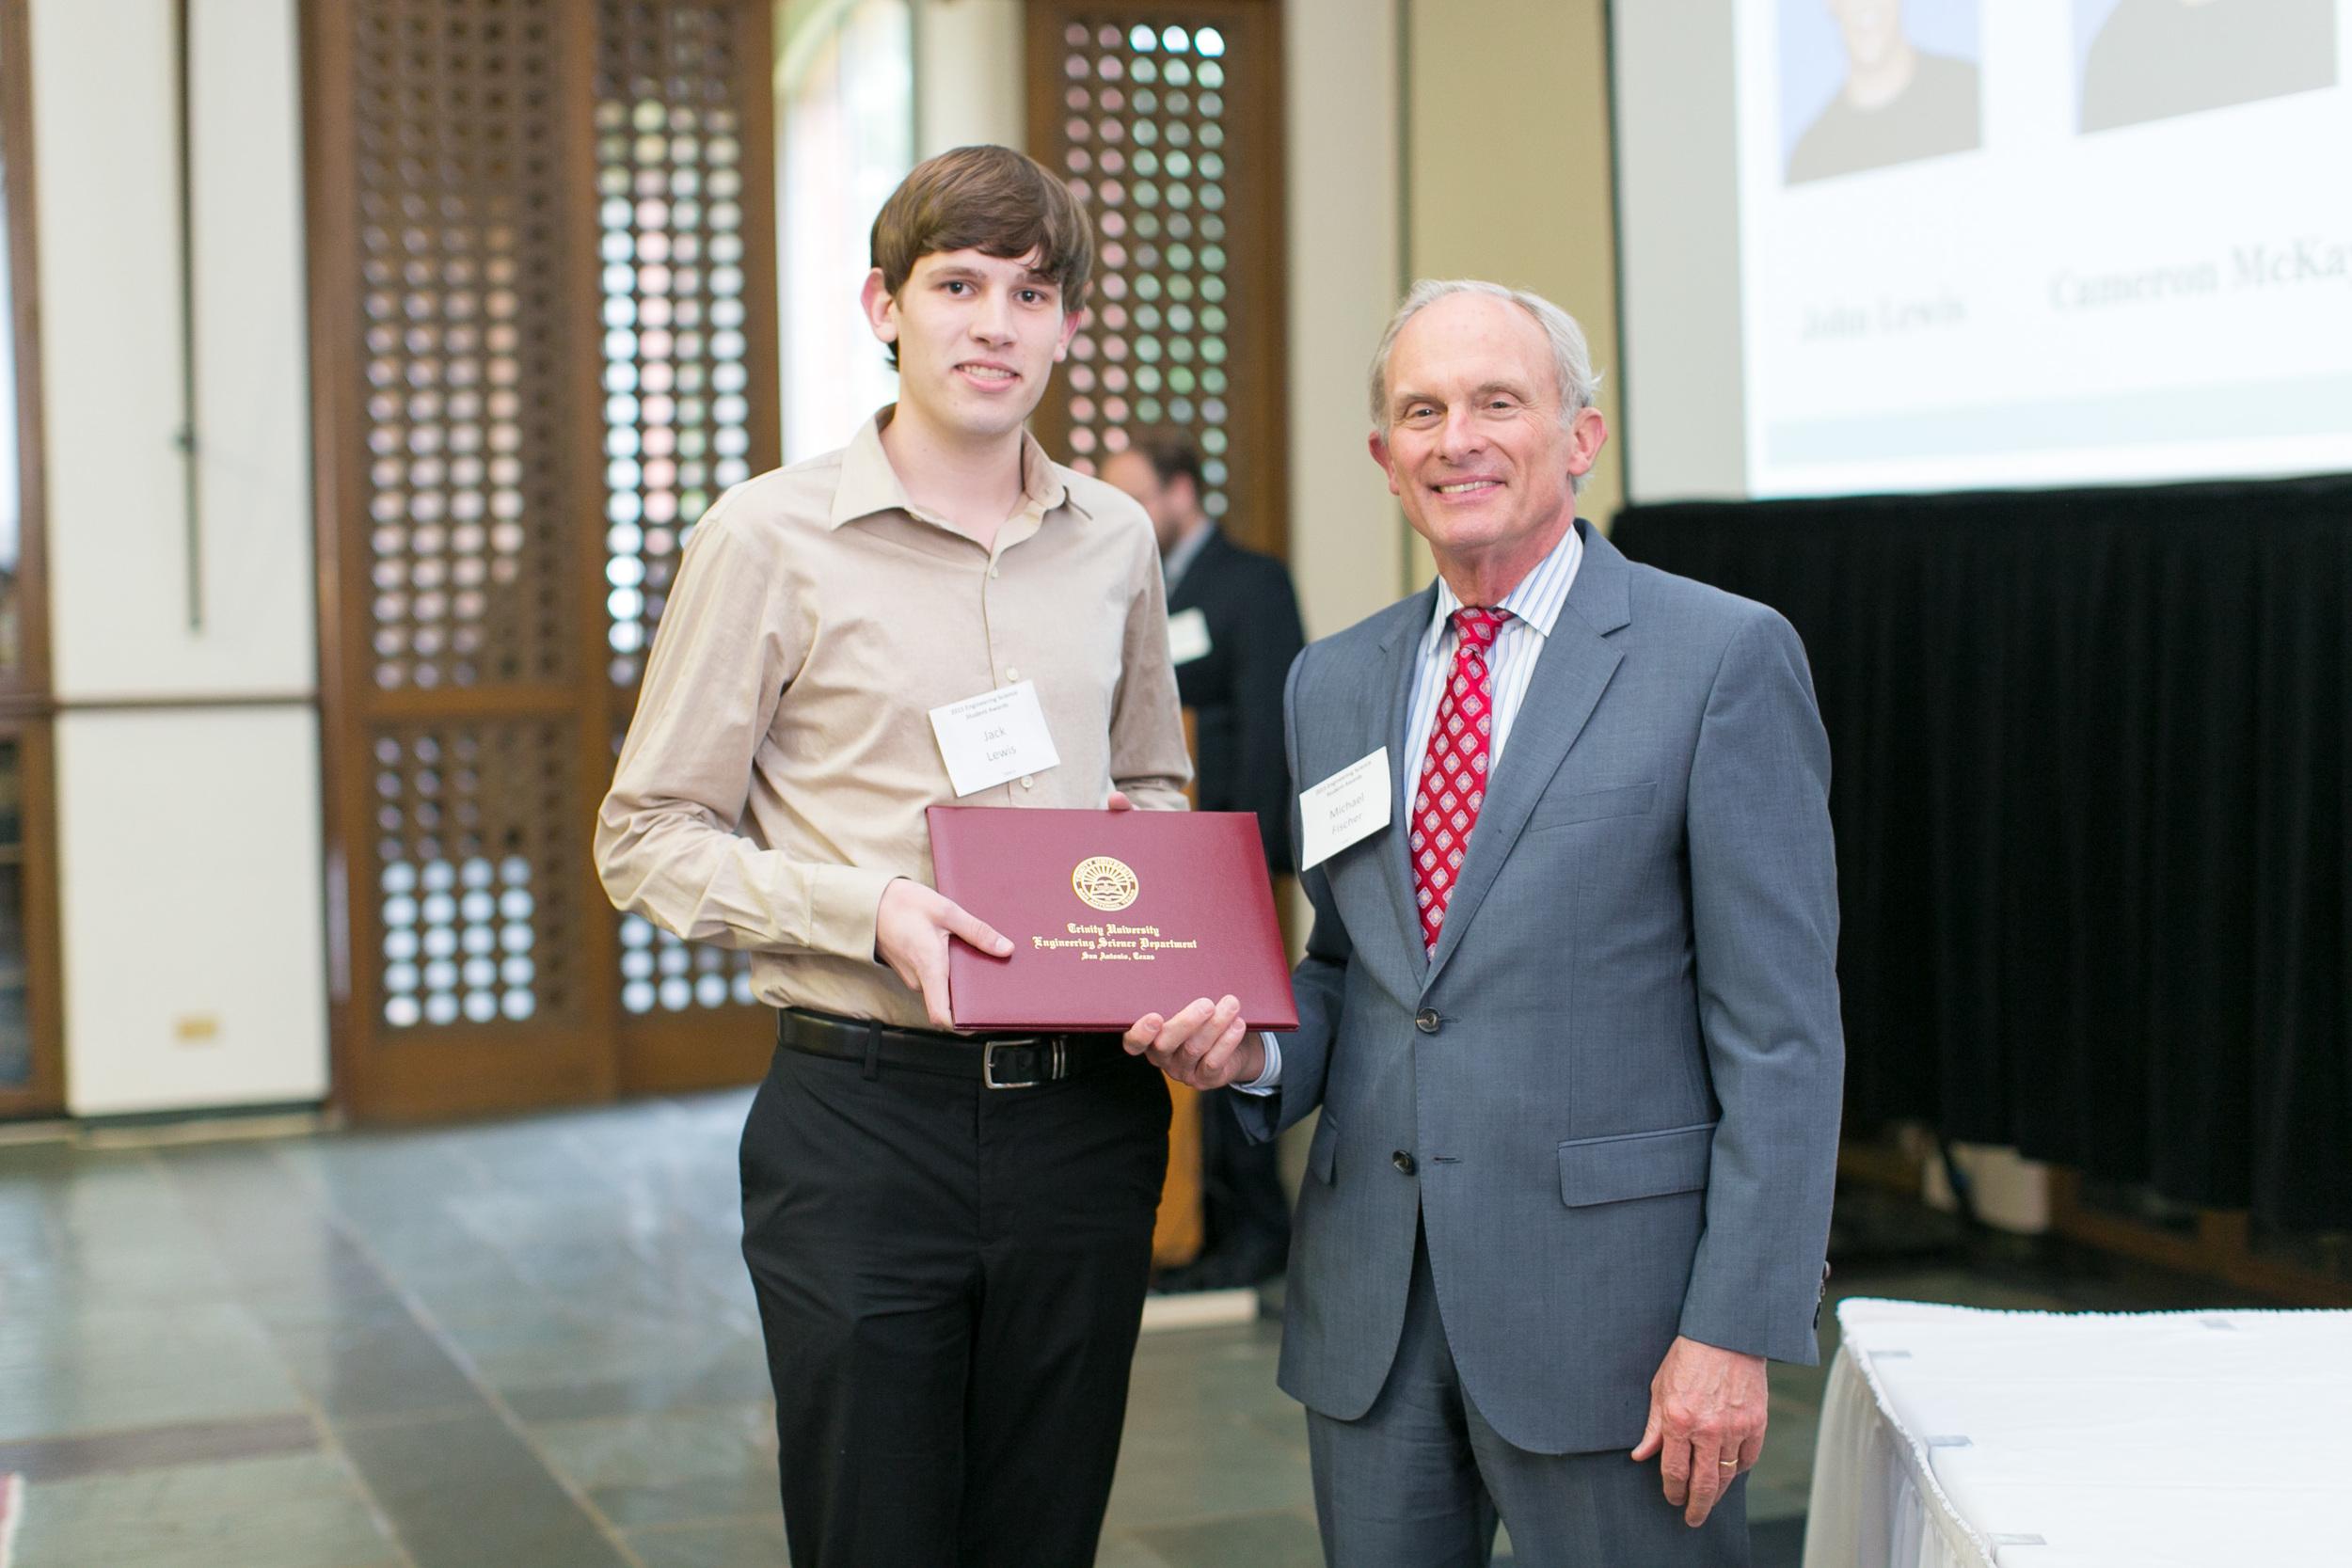 071-Engineering Awards.jpg